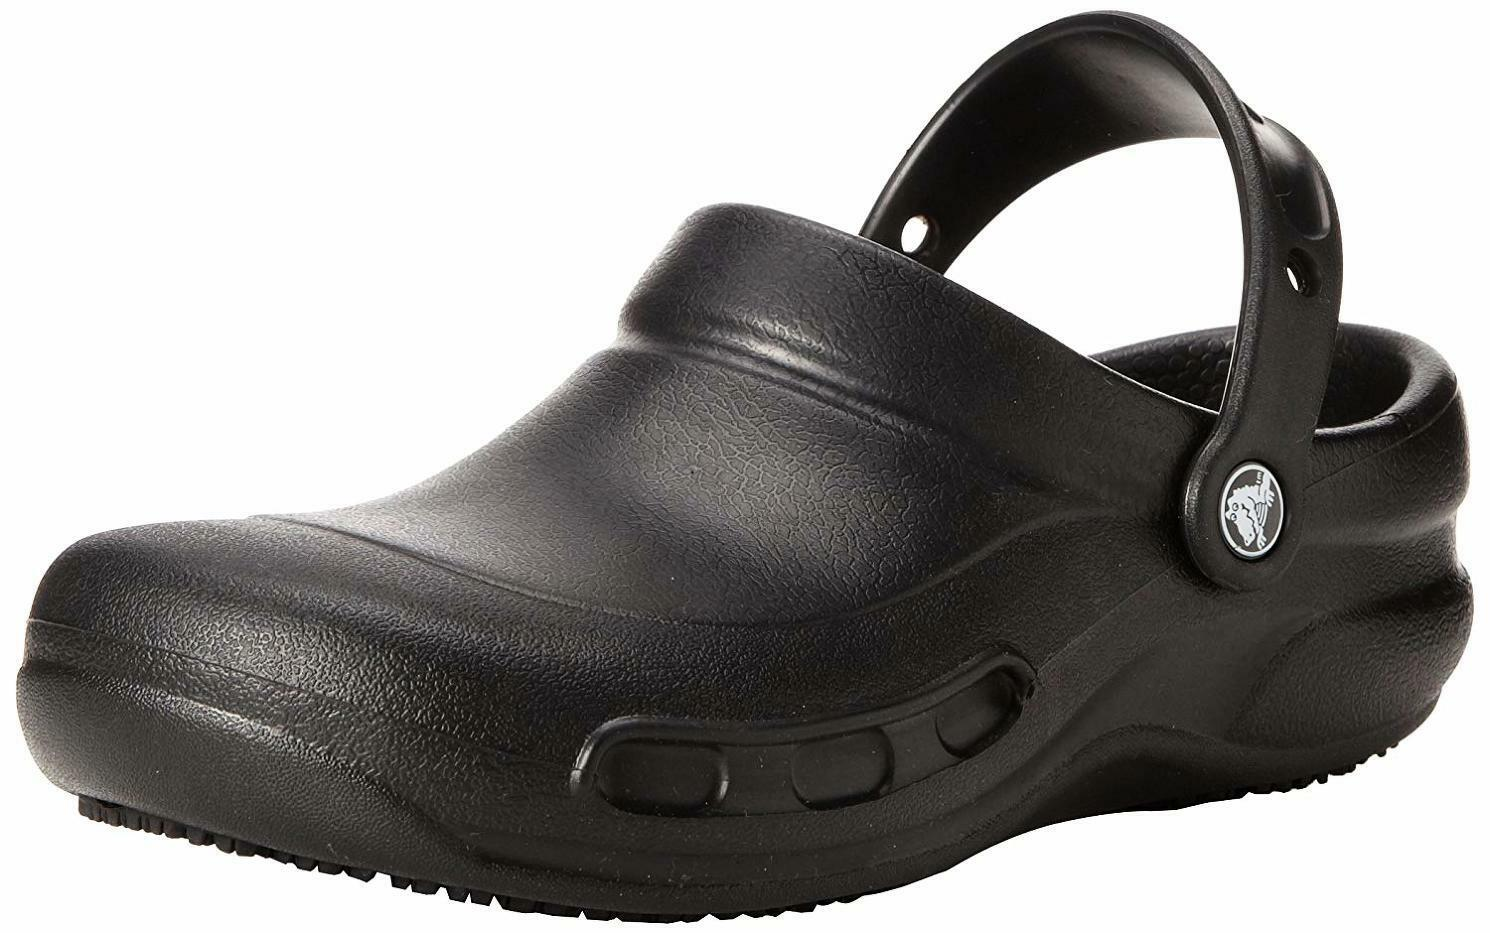 Crocs Men's & Women's Bistro Work Clog - Choose SZ color